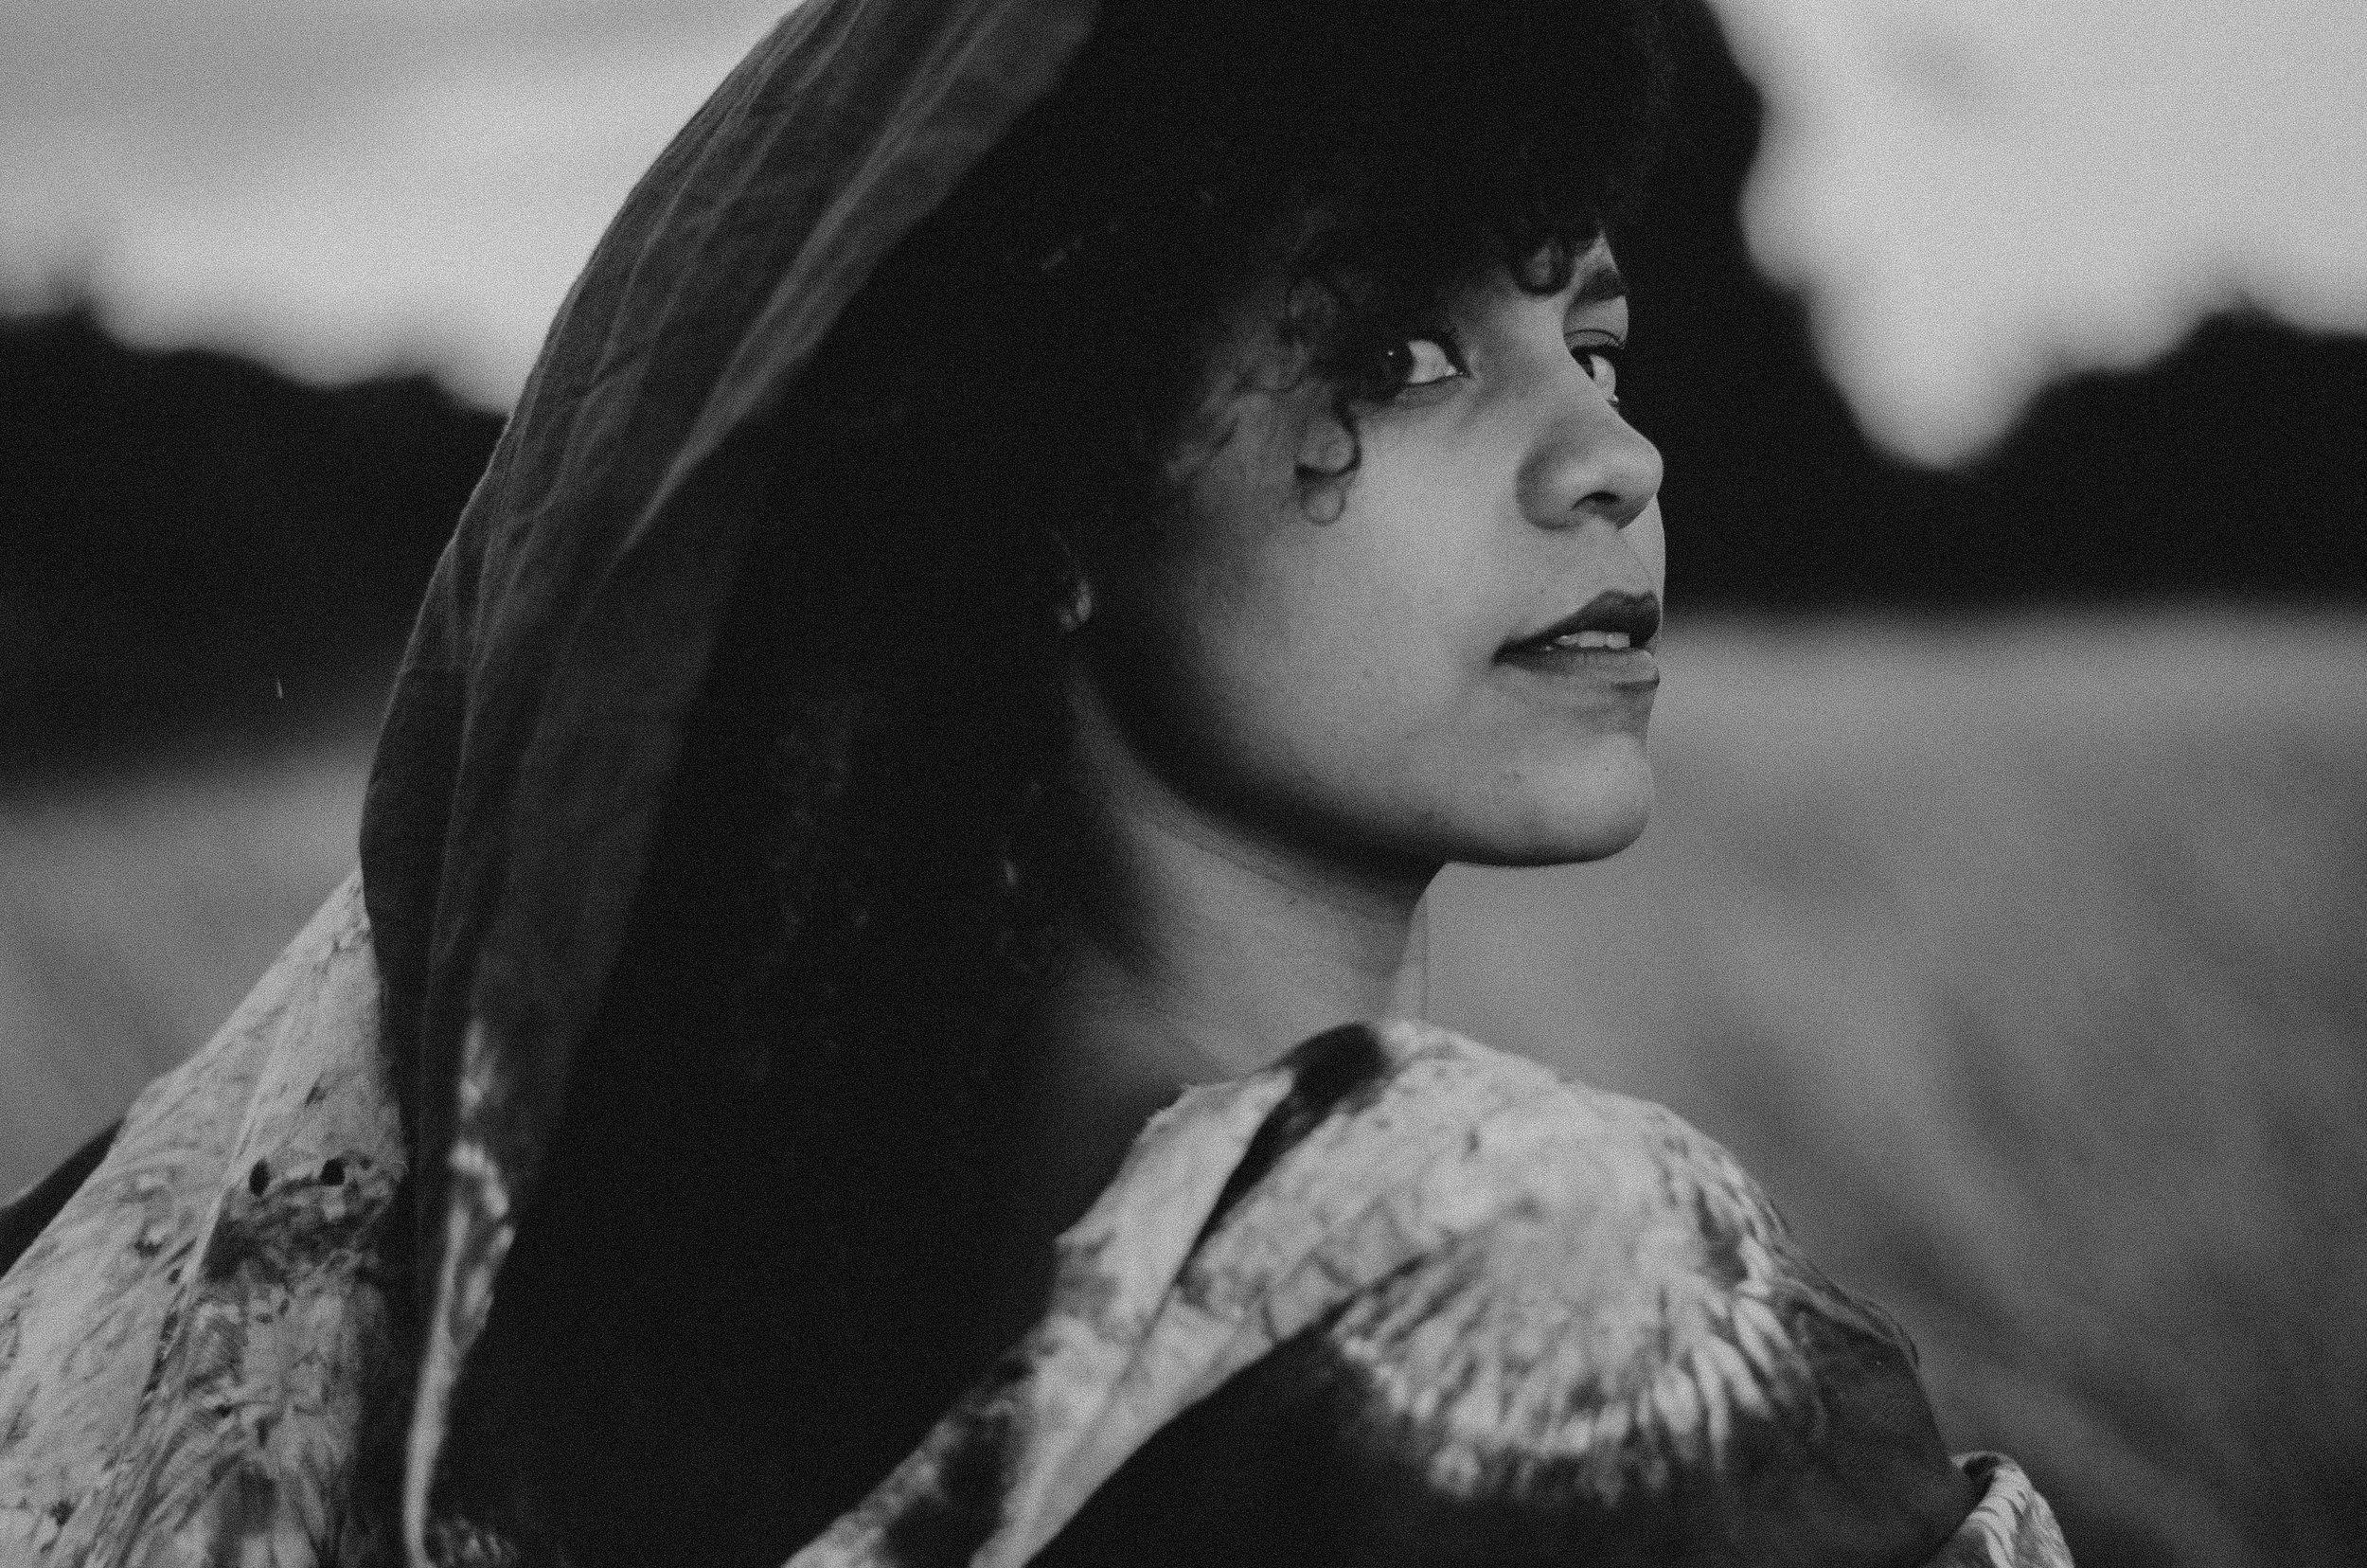 Inka-Portrait-Session-Aiste-Saulyte-Photography-17-07-30-457.jpg